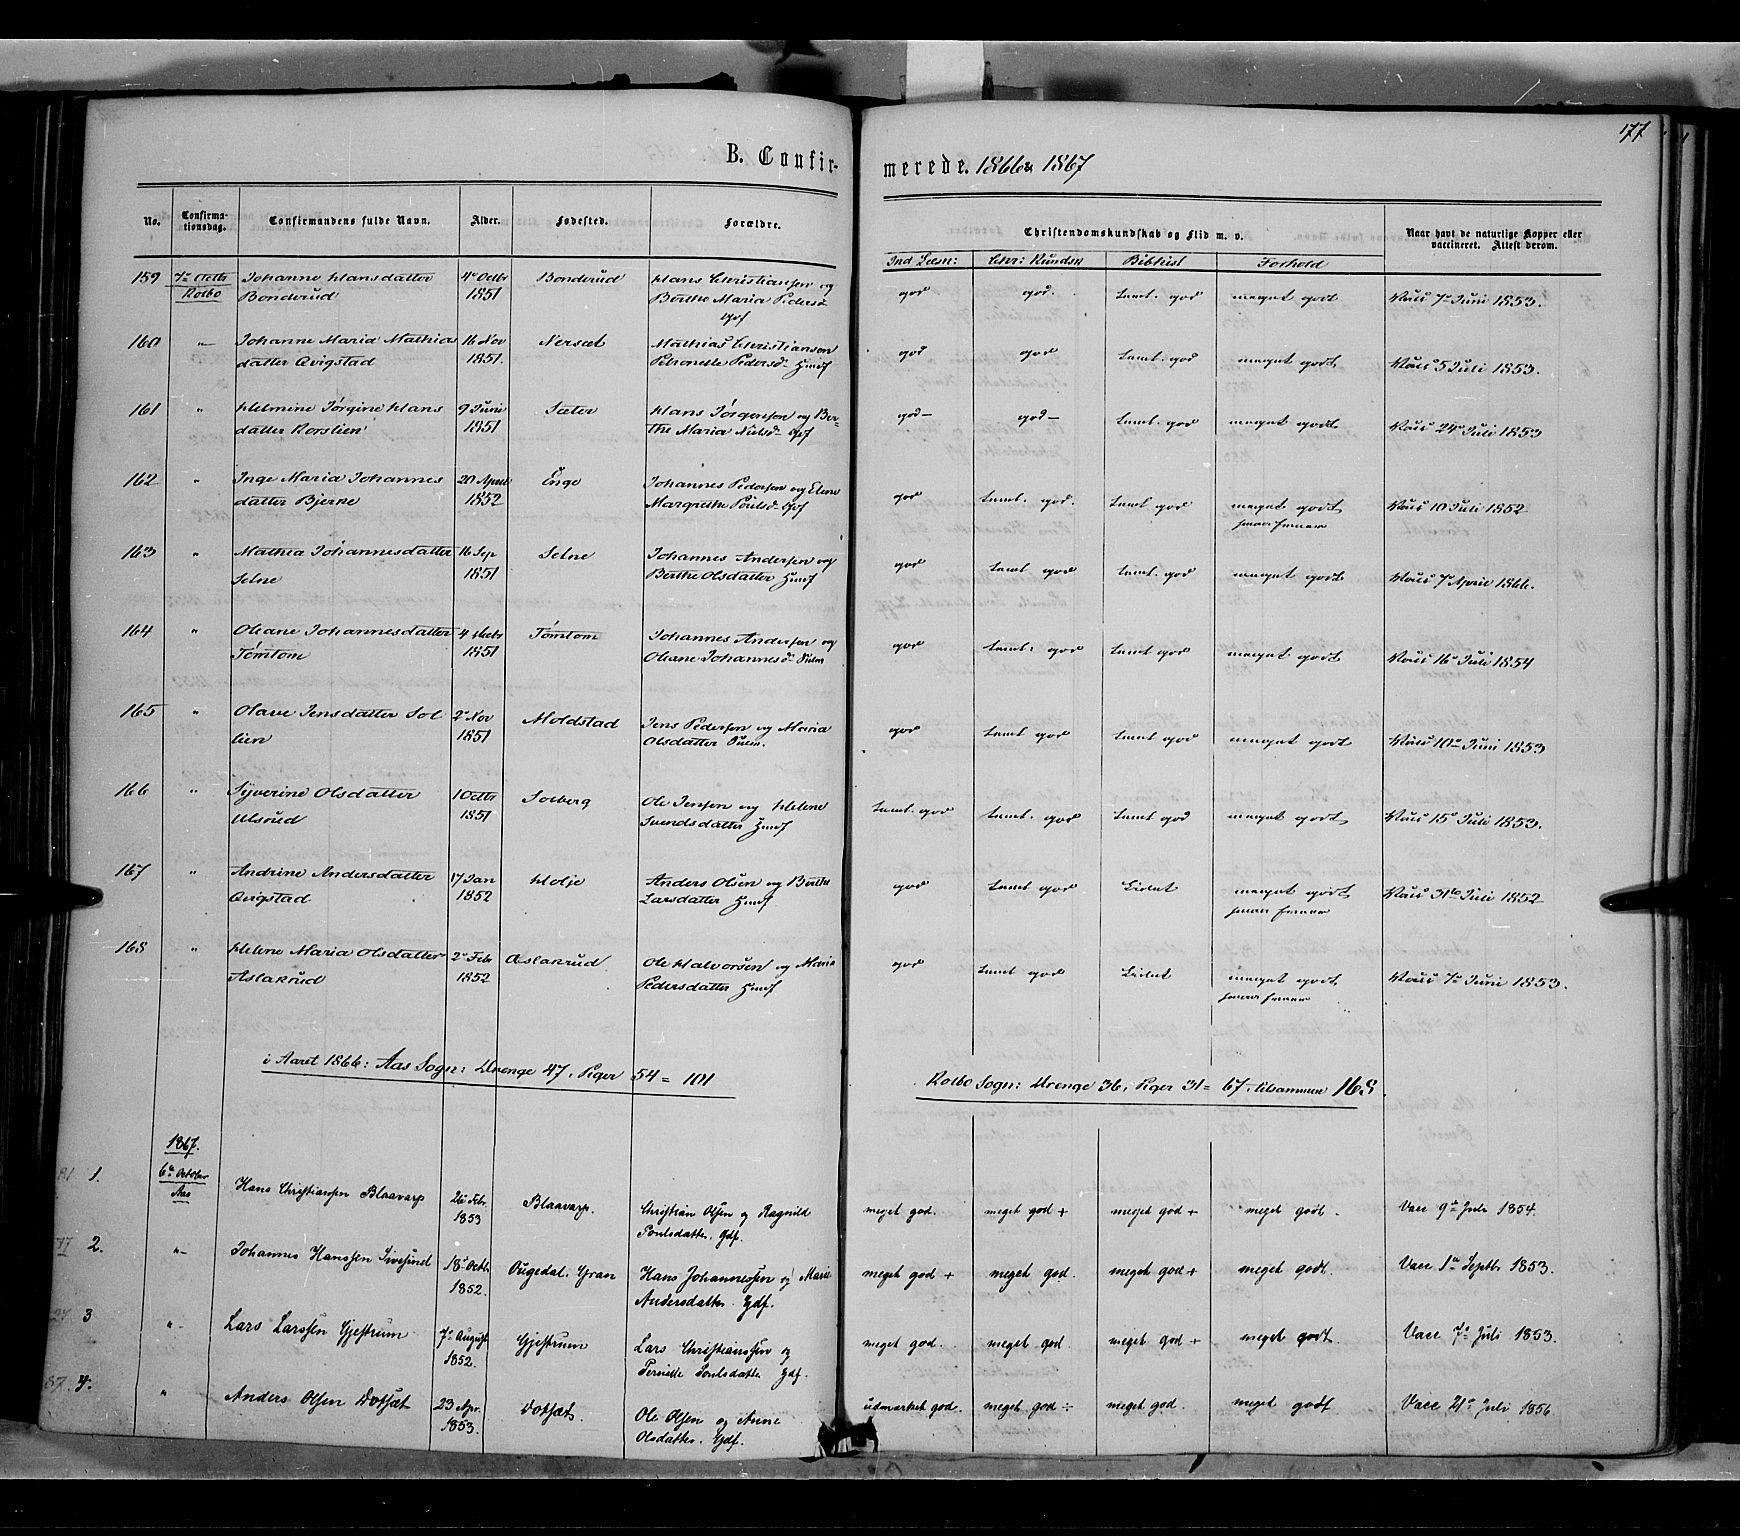 SAH, Vestre Toten prestekontor, H/Ha/Haa/L0007: Ministerialbok nr. 7, 1862-1869, s. 177